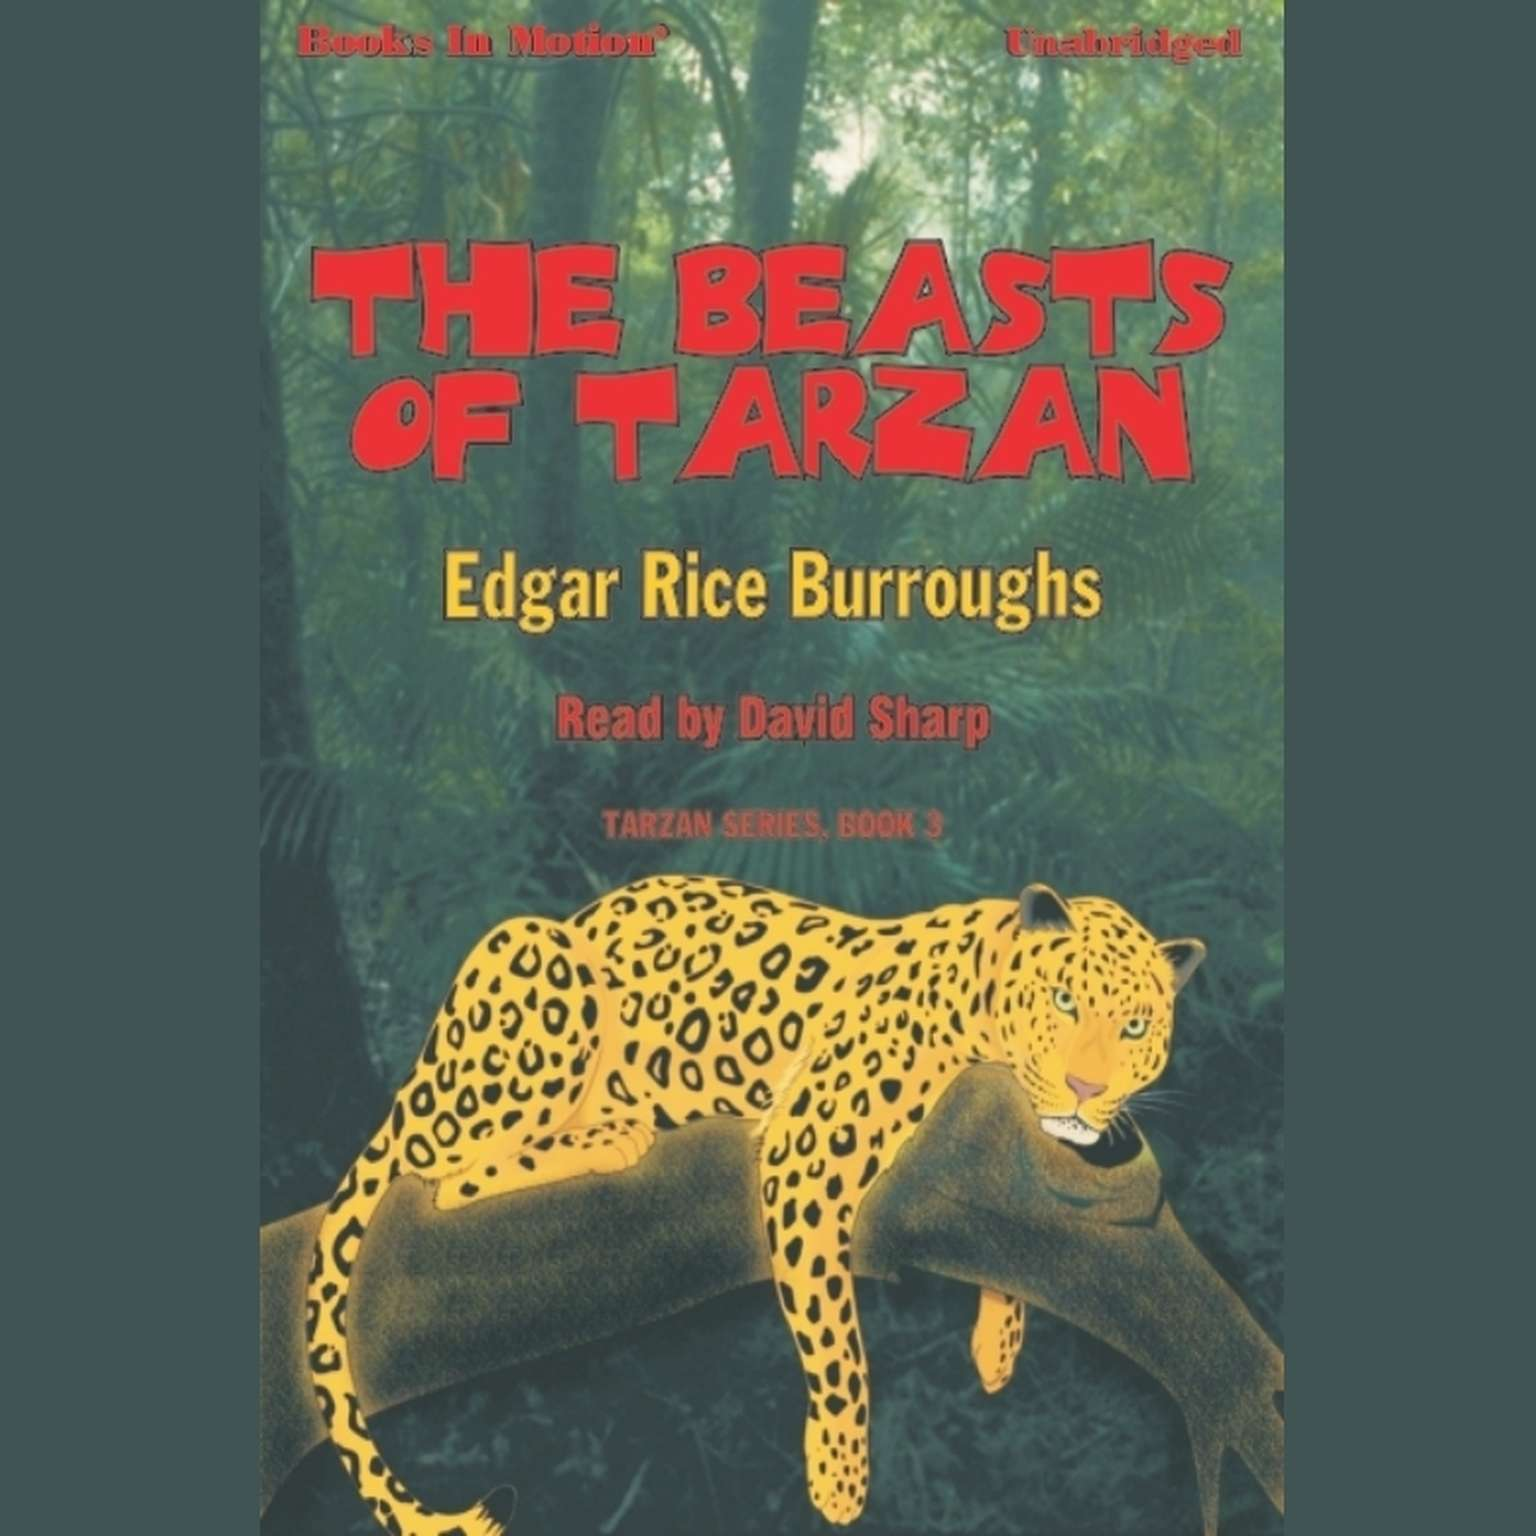 The Beasts Of Tarzan Audiobook, by Edgar Rice Burroughs